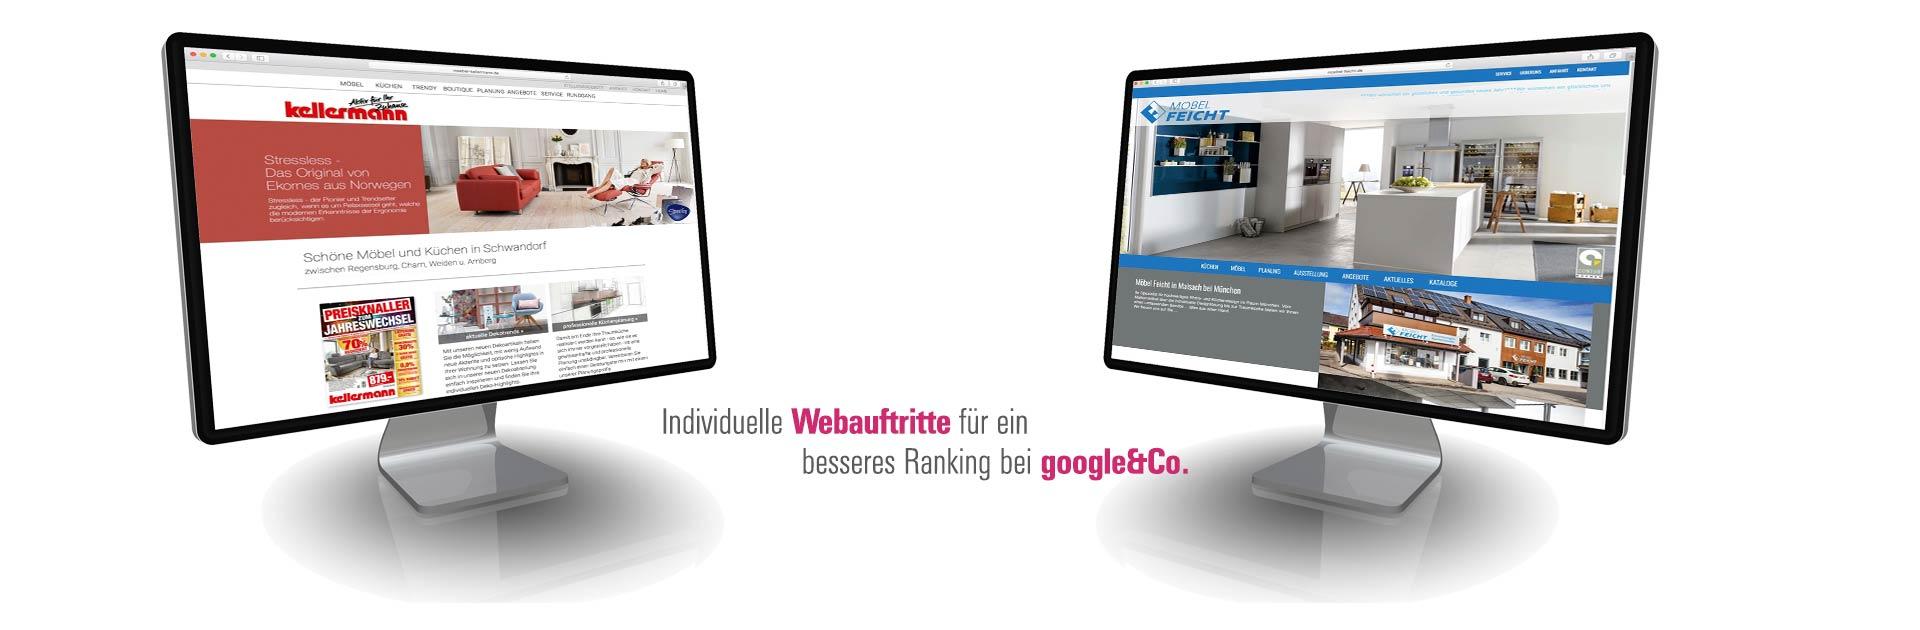 Webdesign und SEO Agentur in München Romanek mediamodule ...